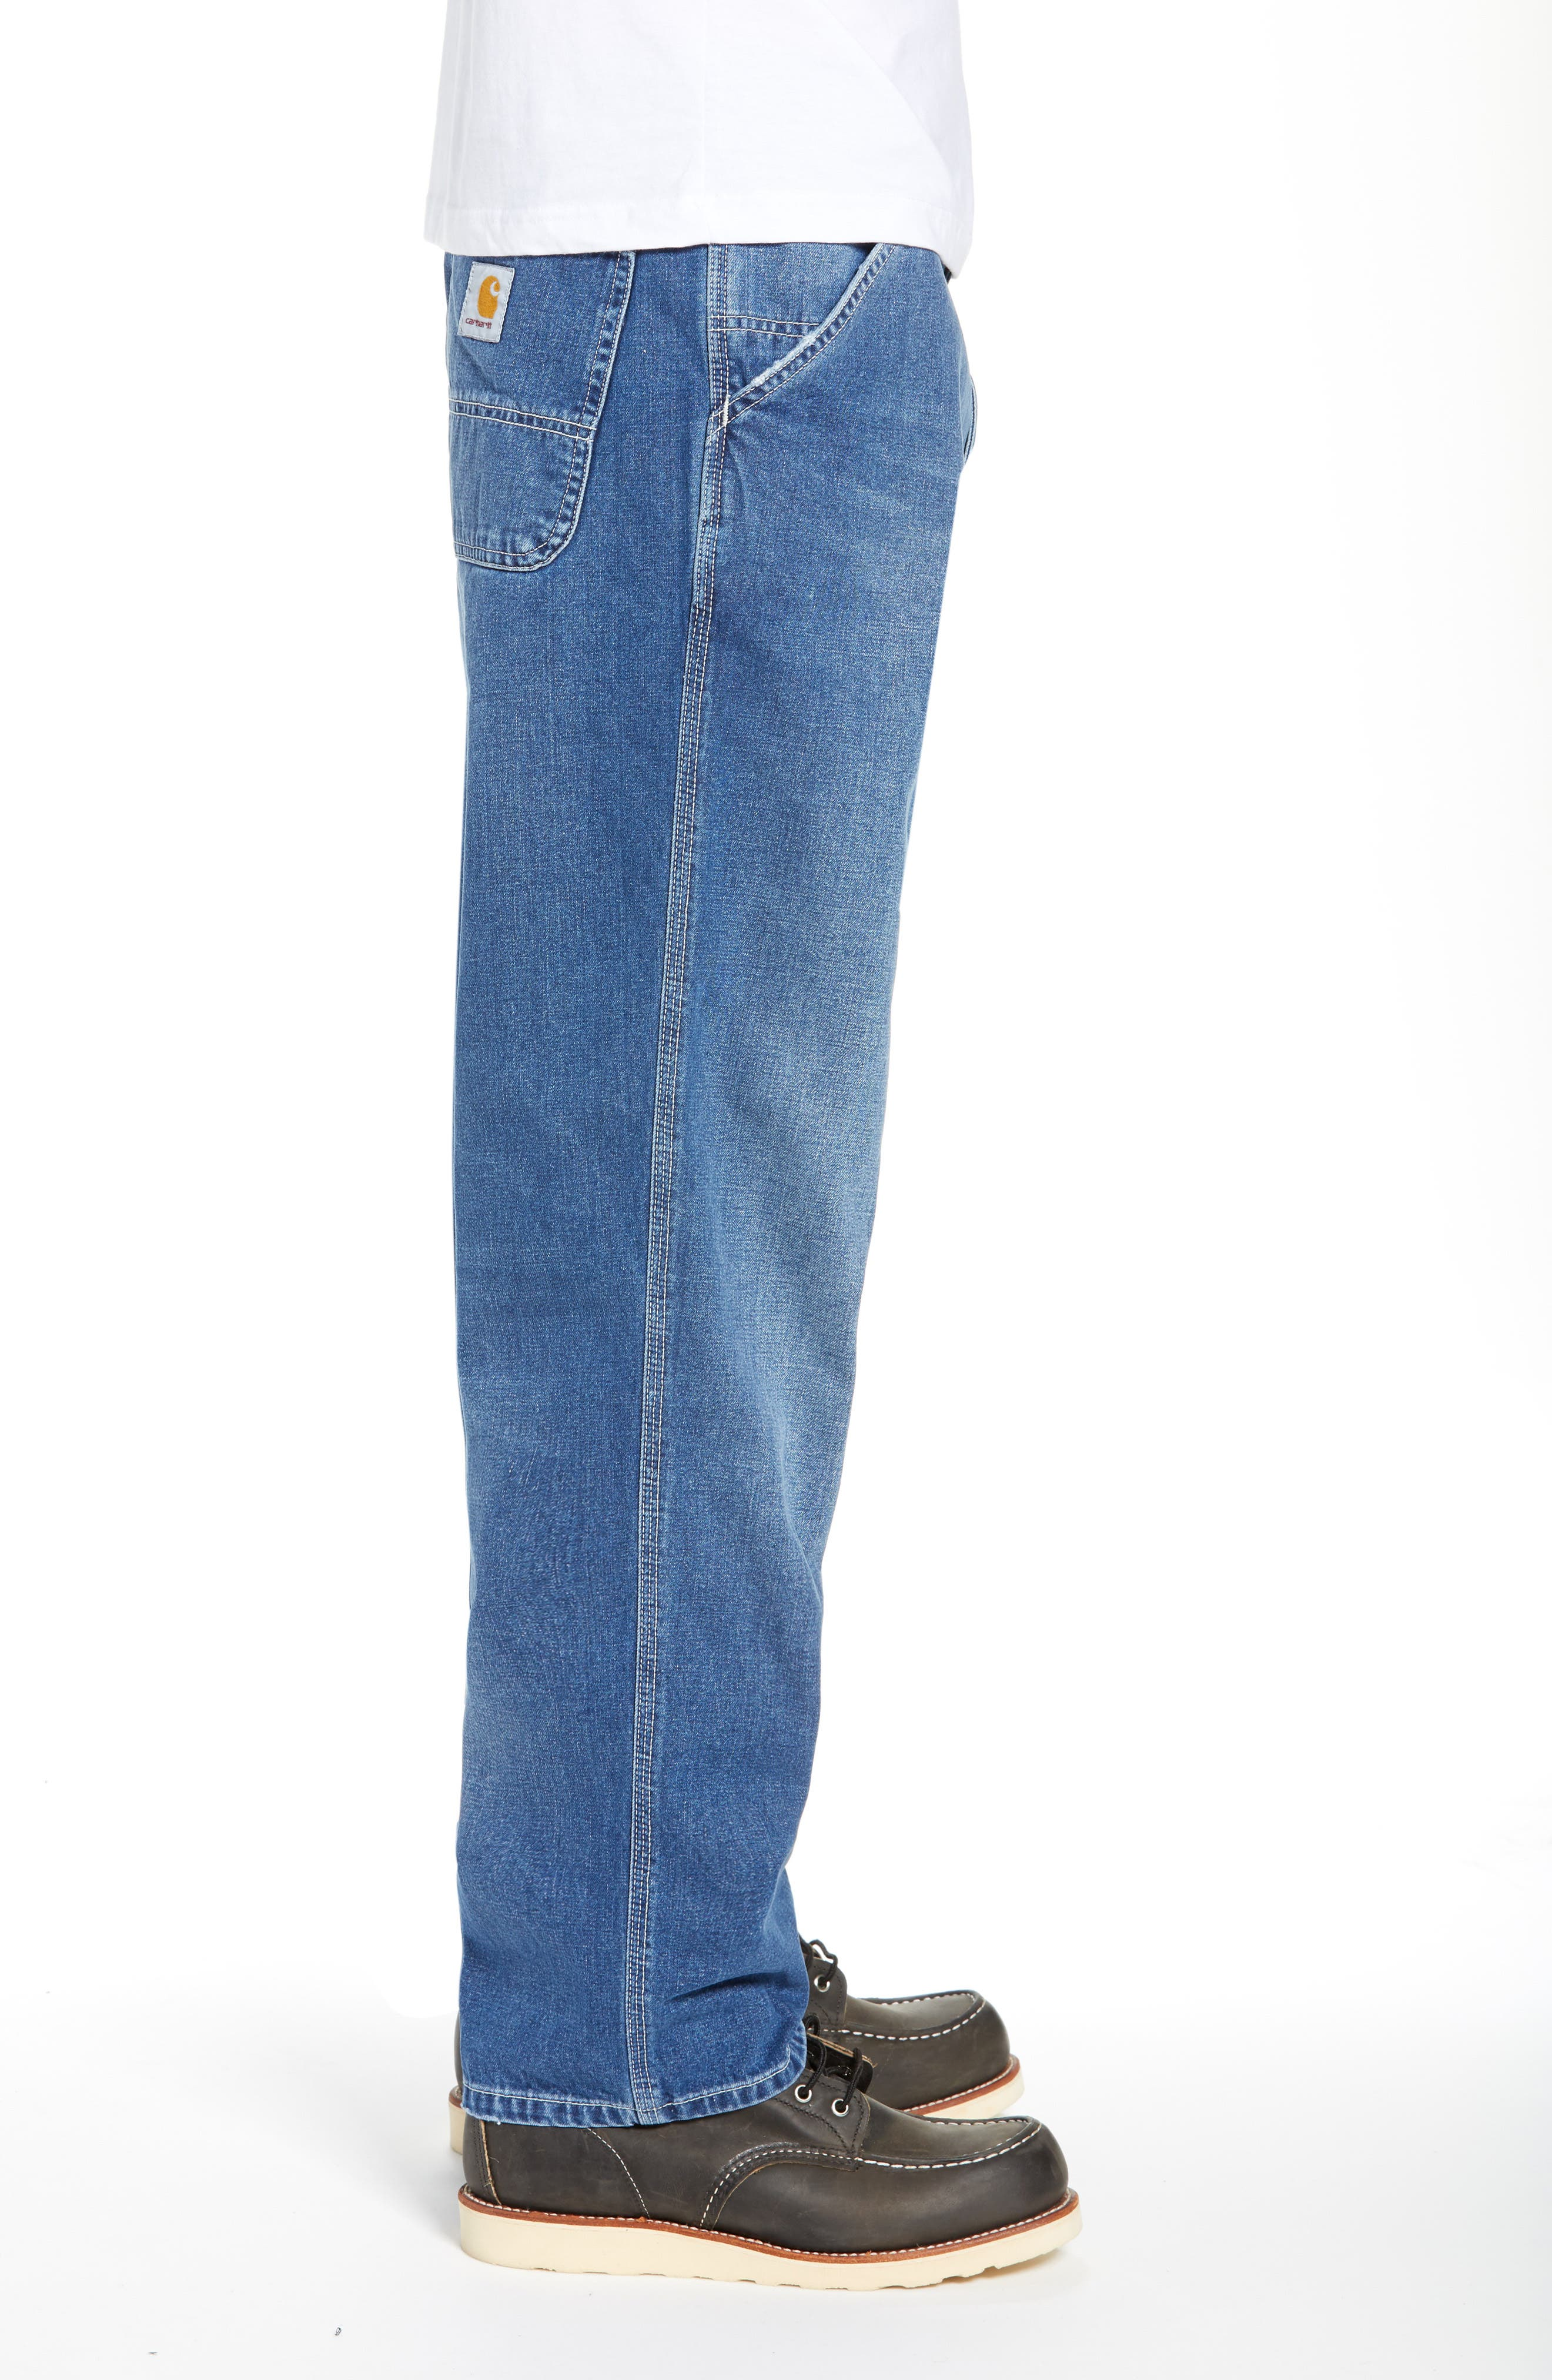 CARHARTT WORK IN PROGRESS,                             Simple Denim Jeans,                             Alternate thumbnail 3, color,                             BLUE